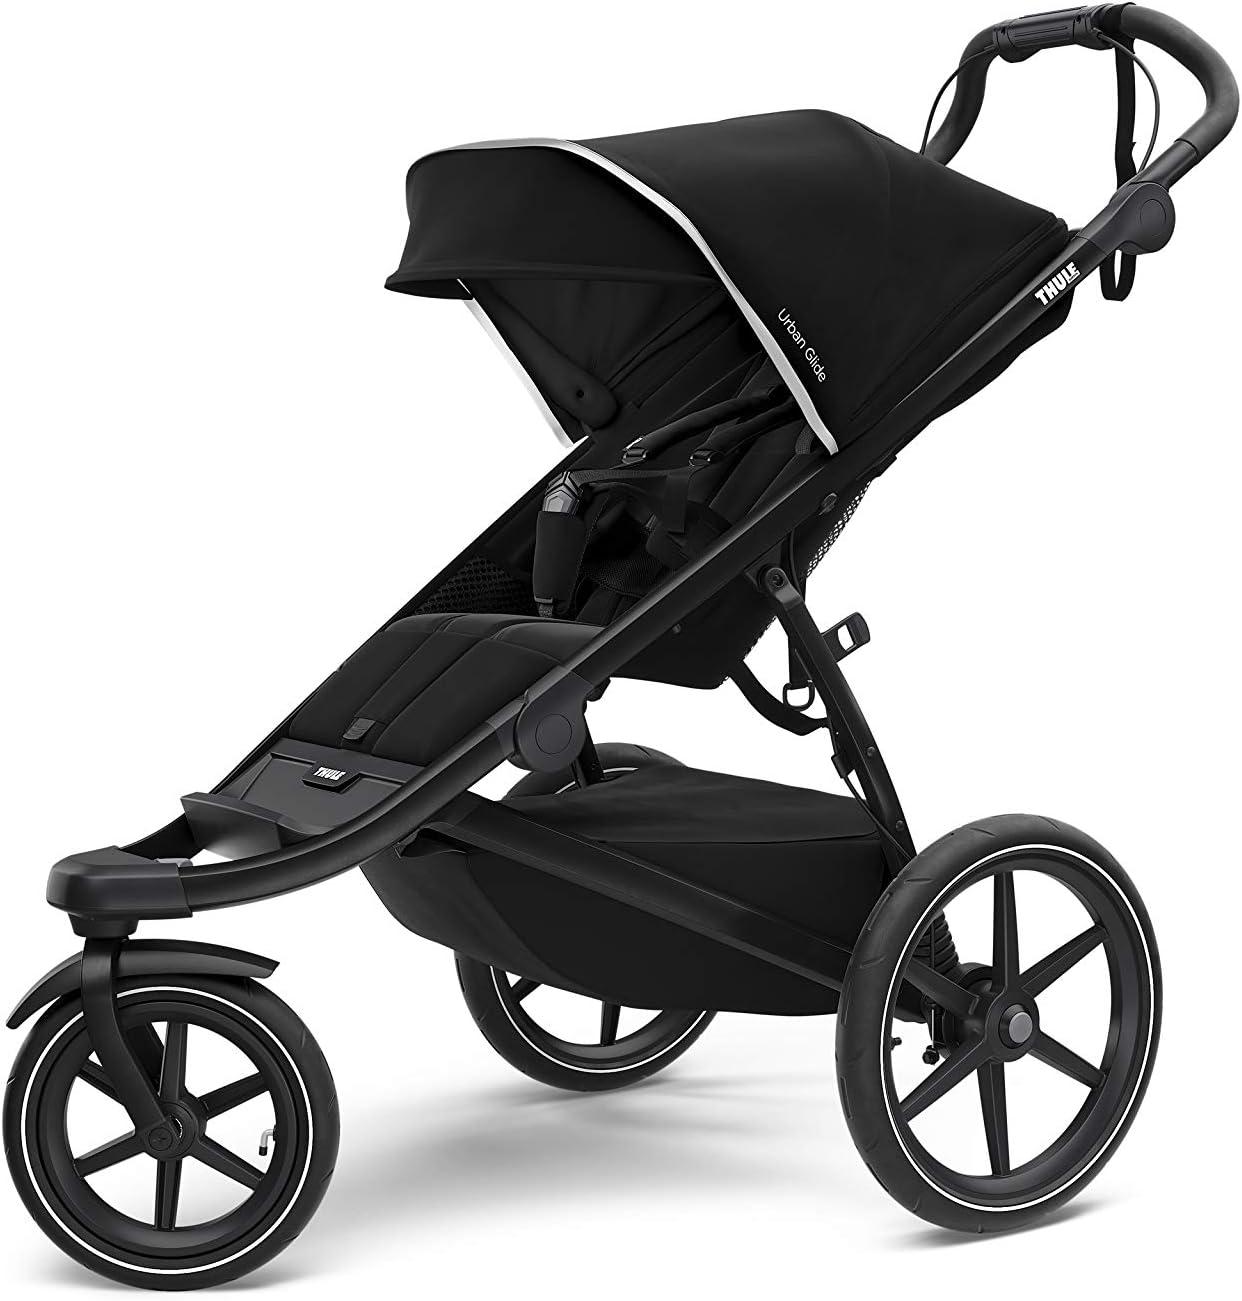 Thule-Urban-Glide-2-Jogging-Stroller/